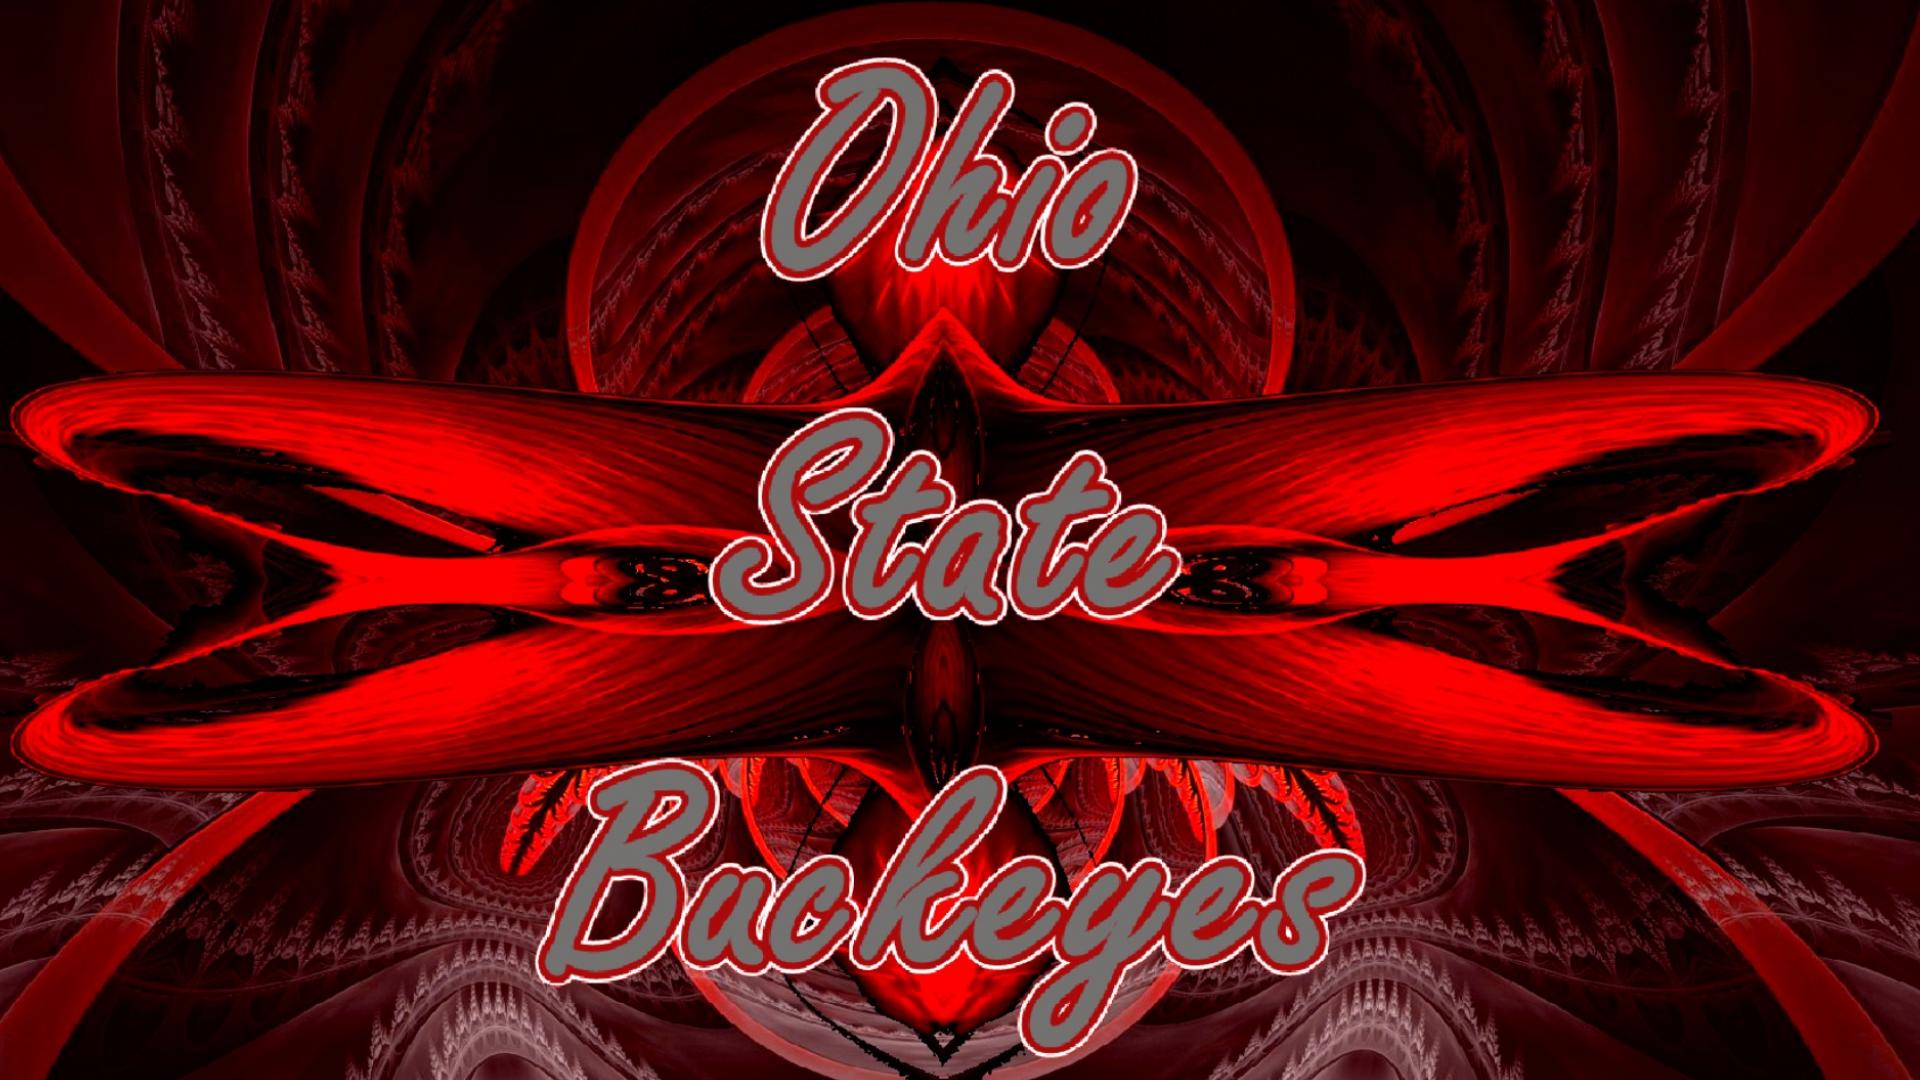 2014 Ohio State Buckeyes Football